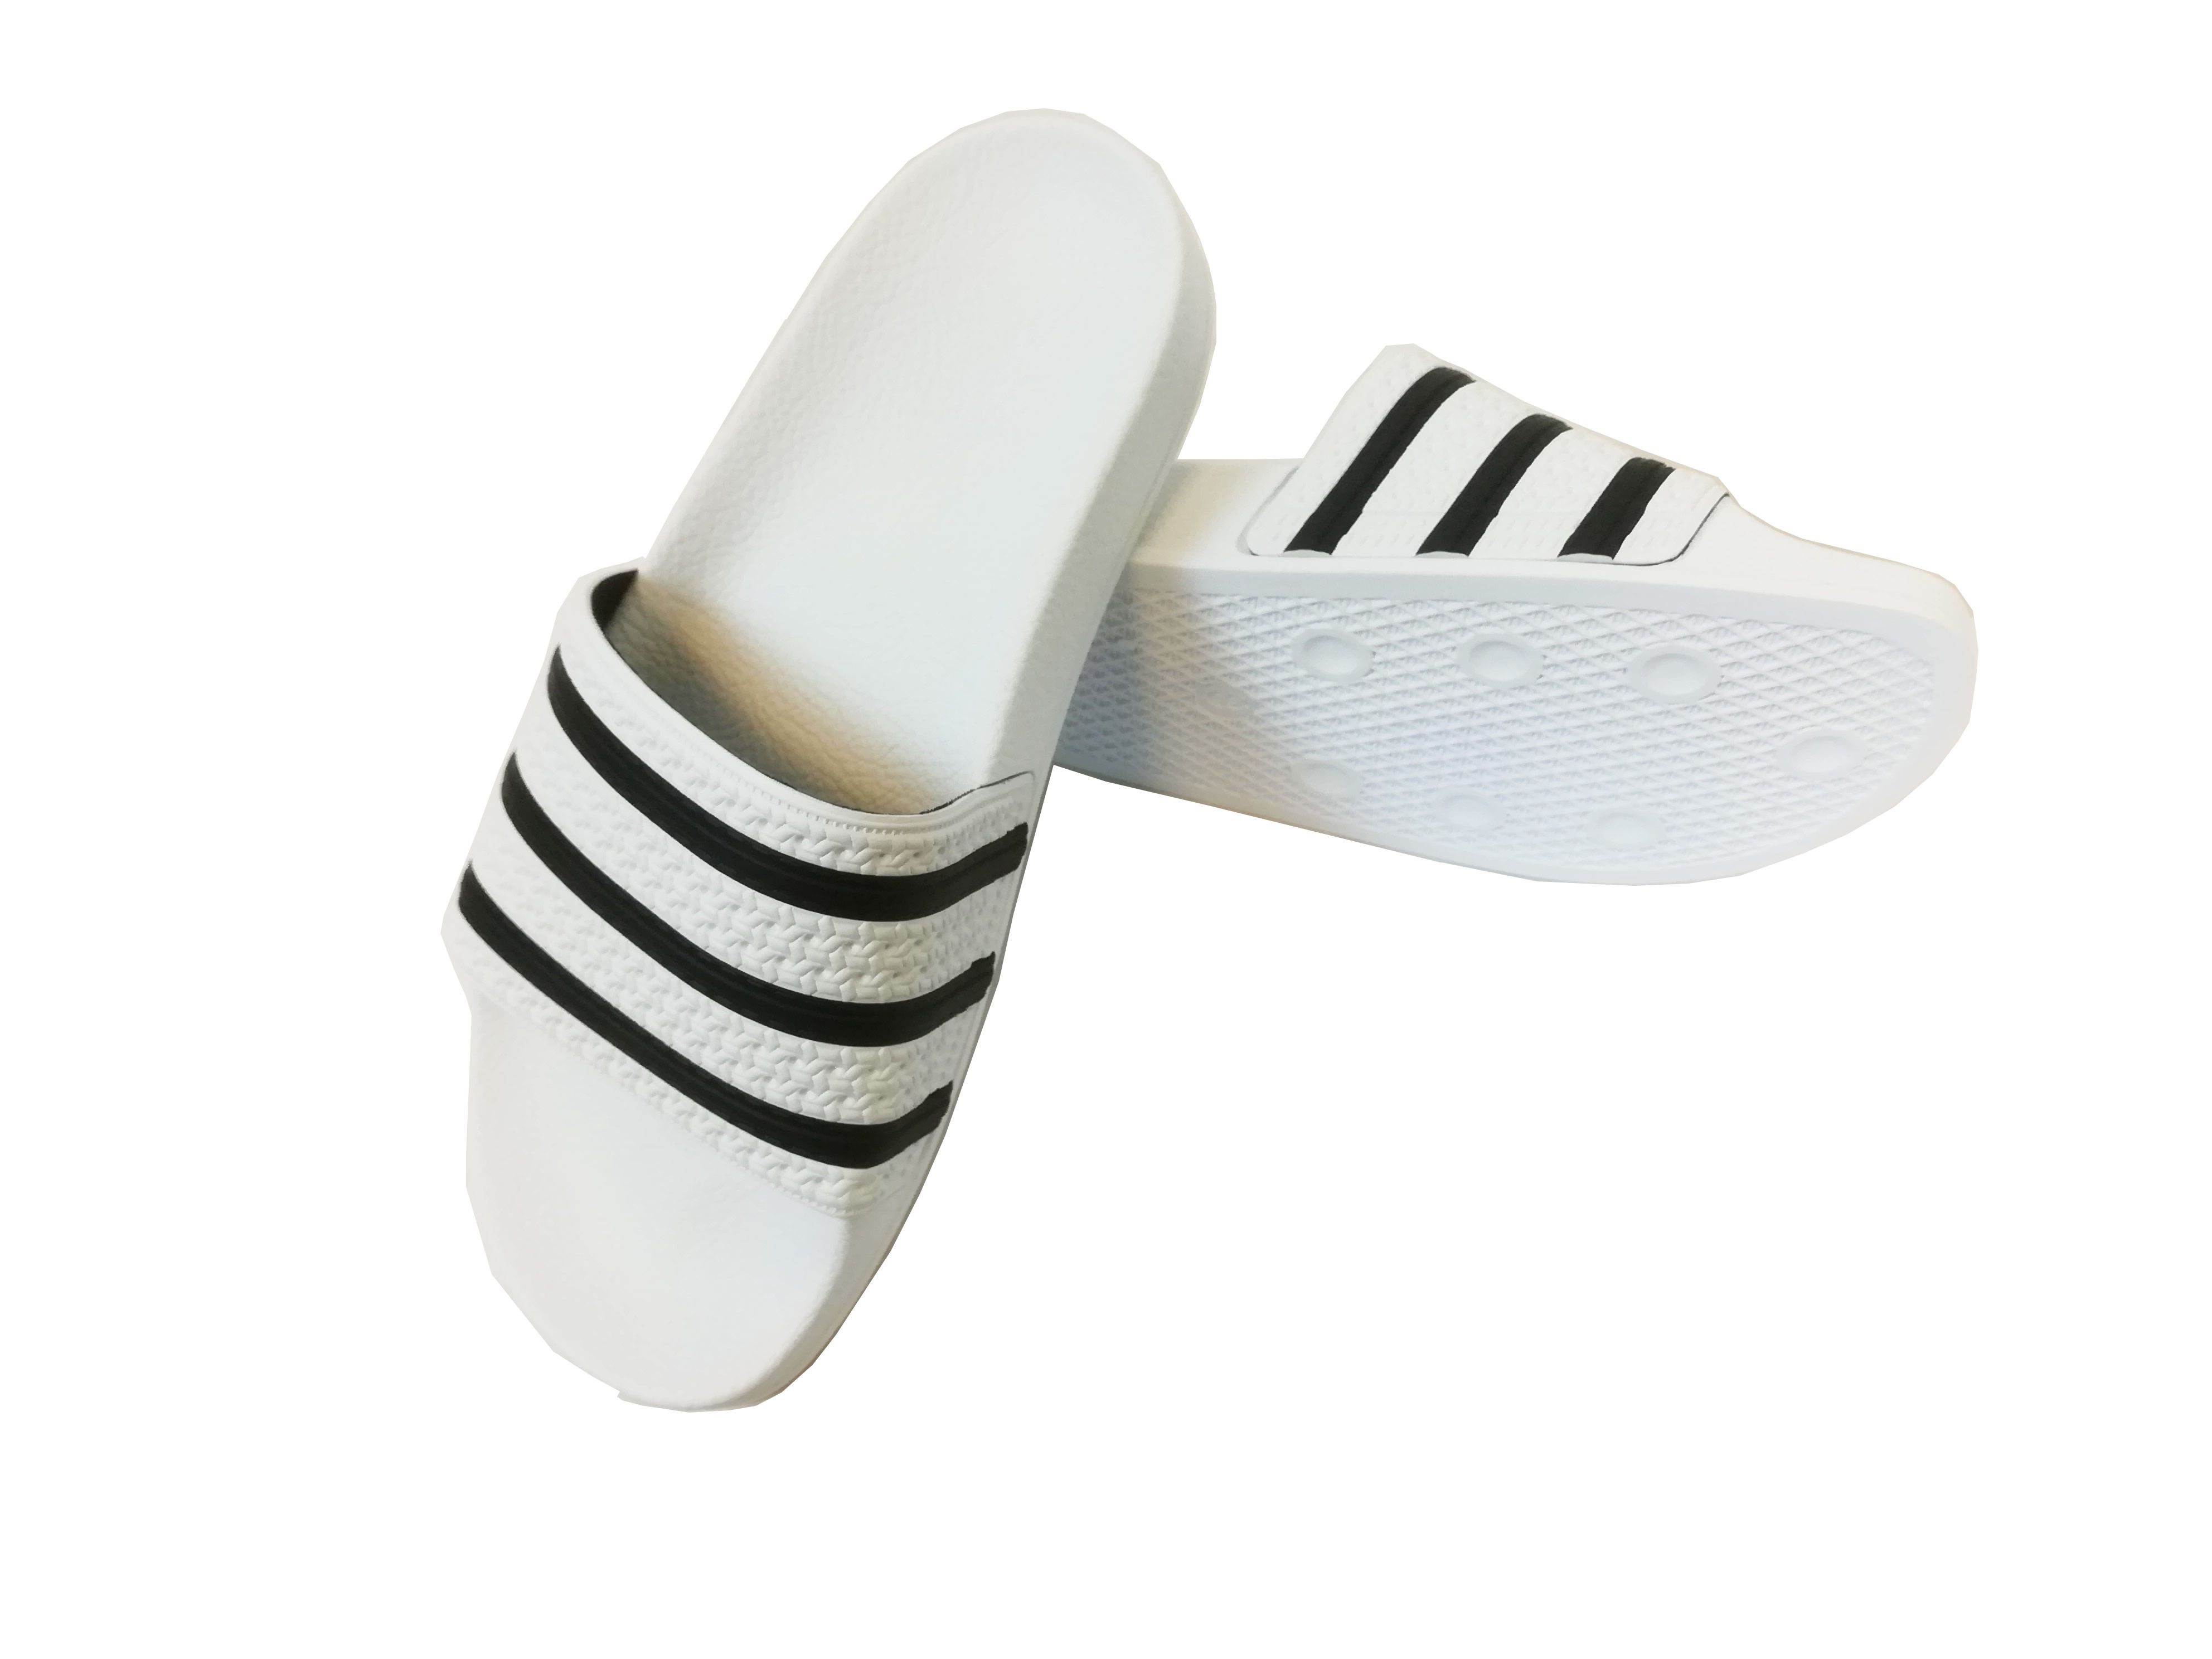 adidas ciabatte adilette bianche